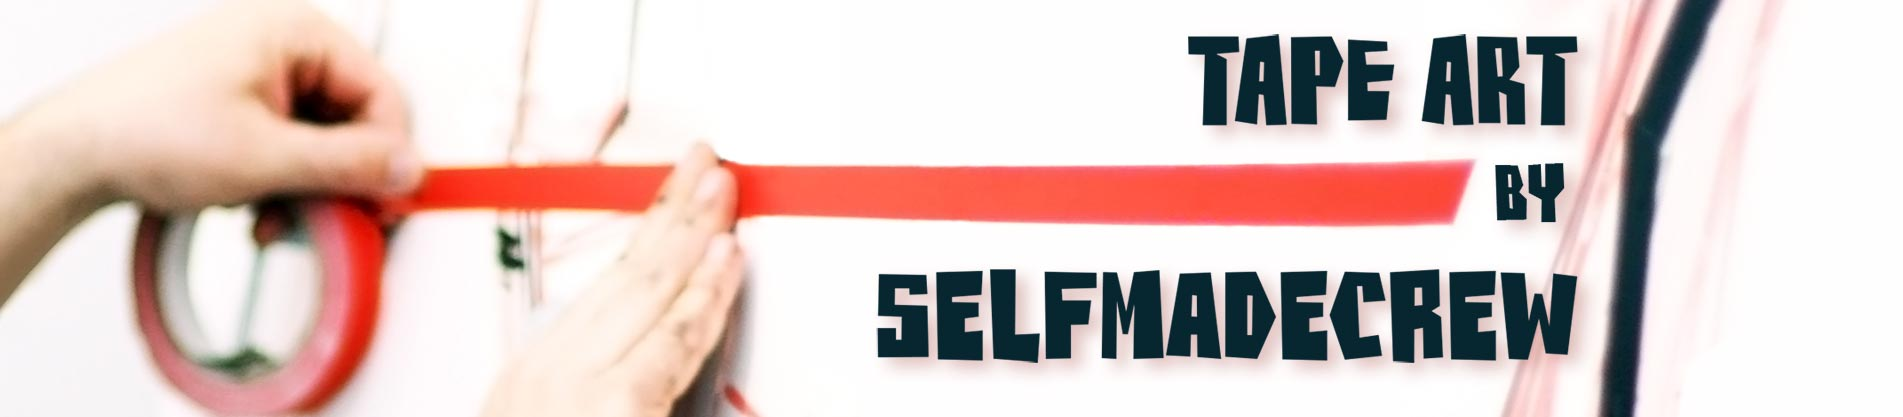 Tape Art by SELFMADECREW- Die Vielfalt der Klebe-Kunst Logo